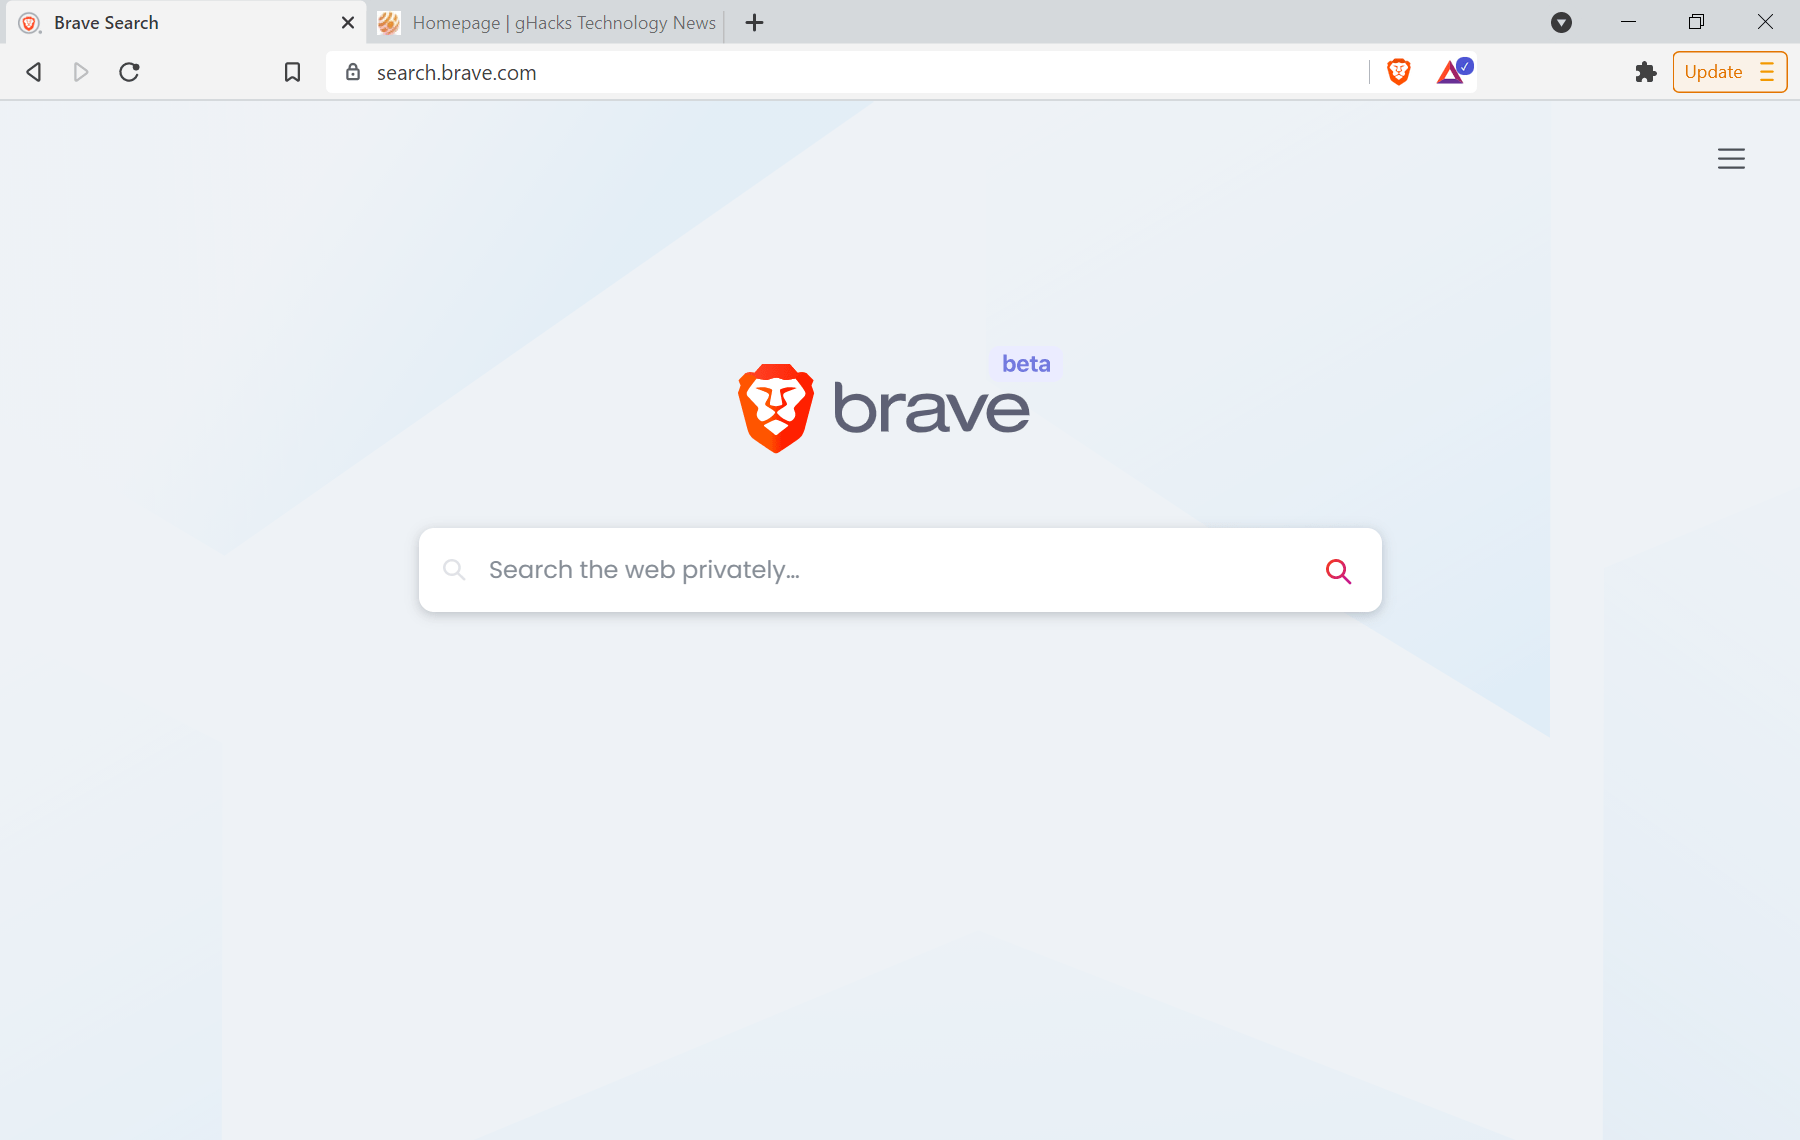 búsqueda valiente beta